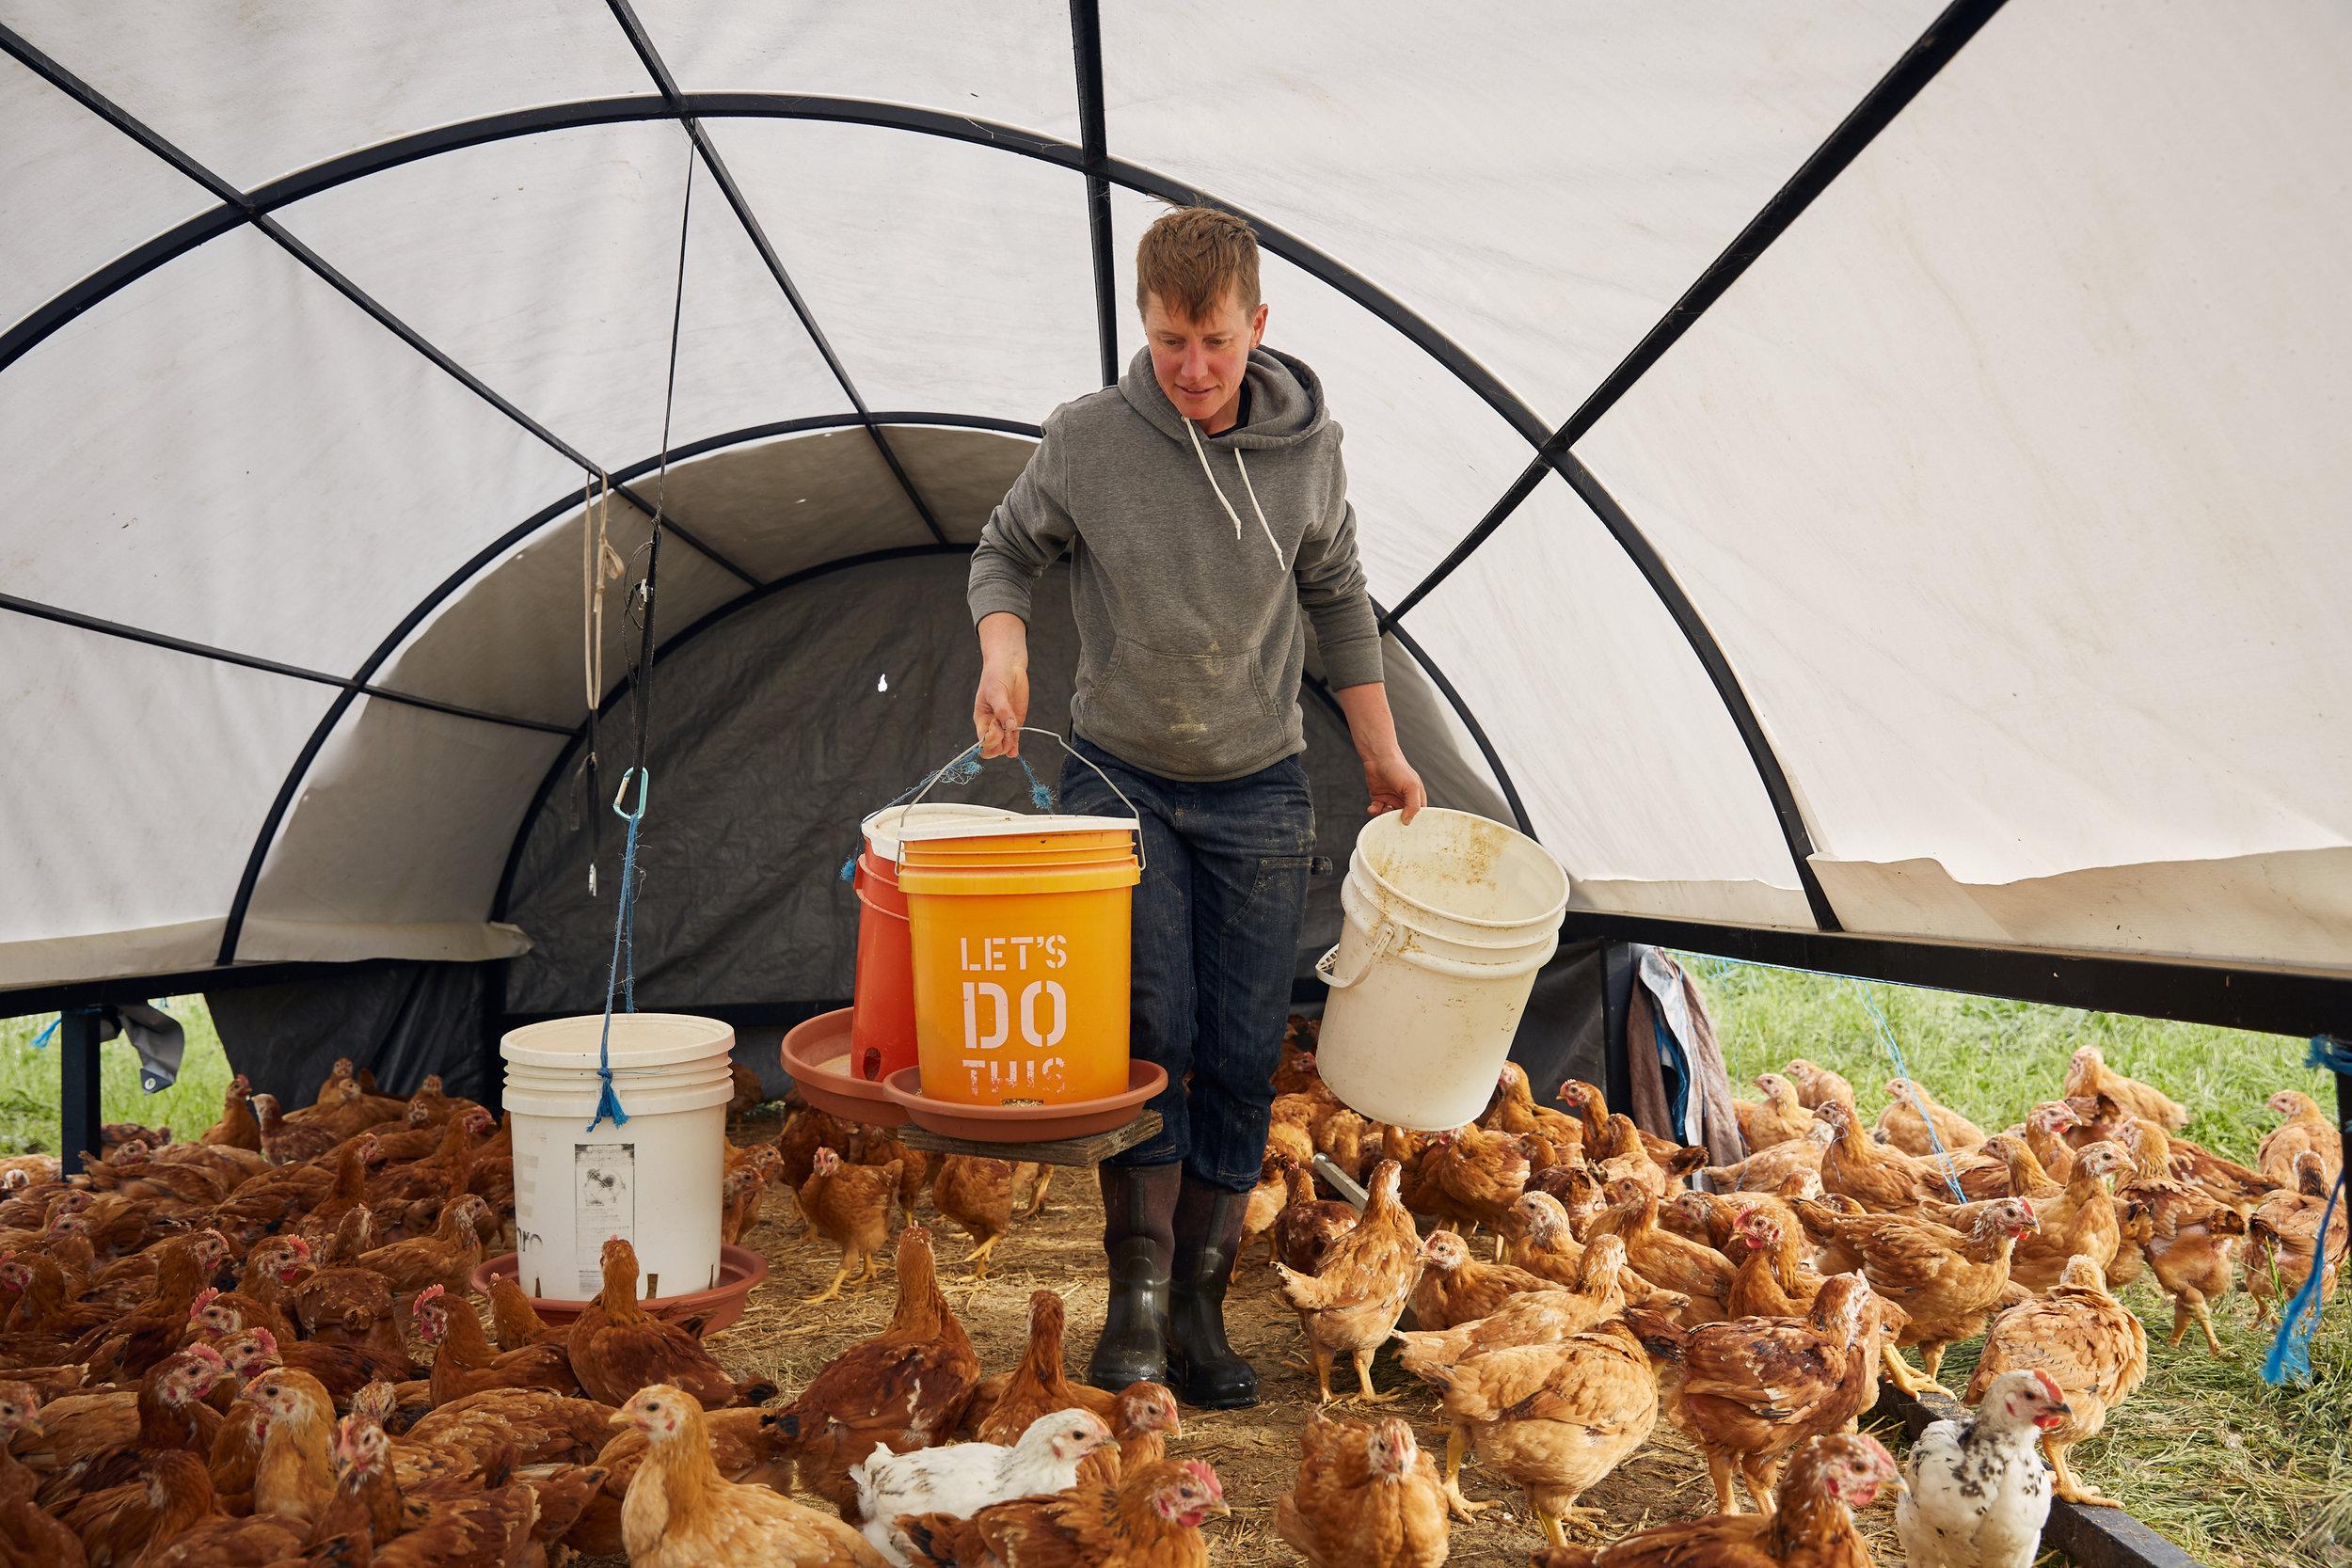 RDF_Appeal-18_7_Feed-Chickens_6.jpg